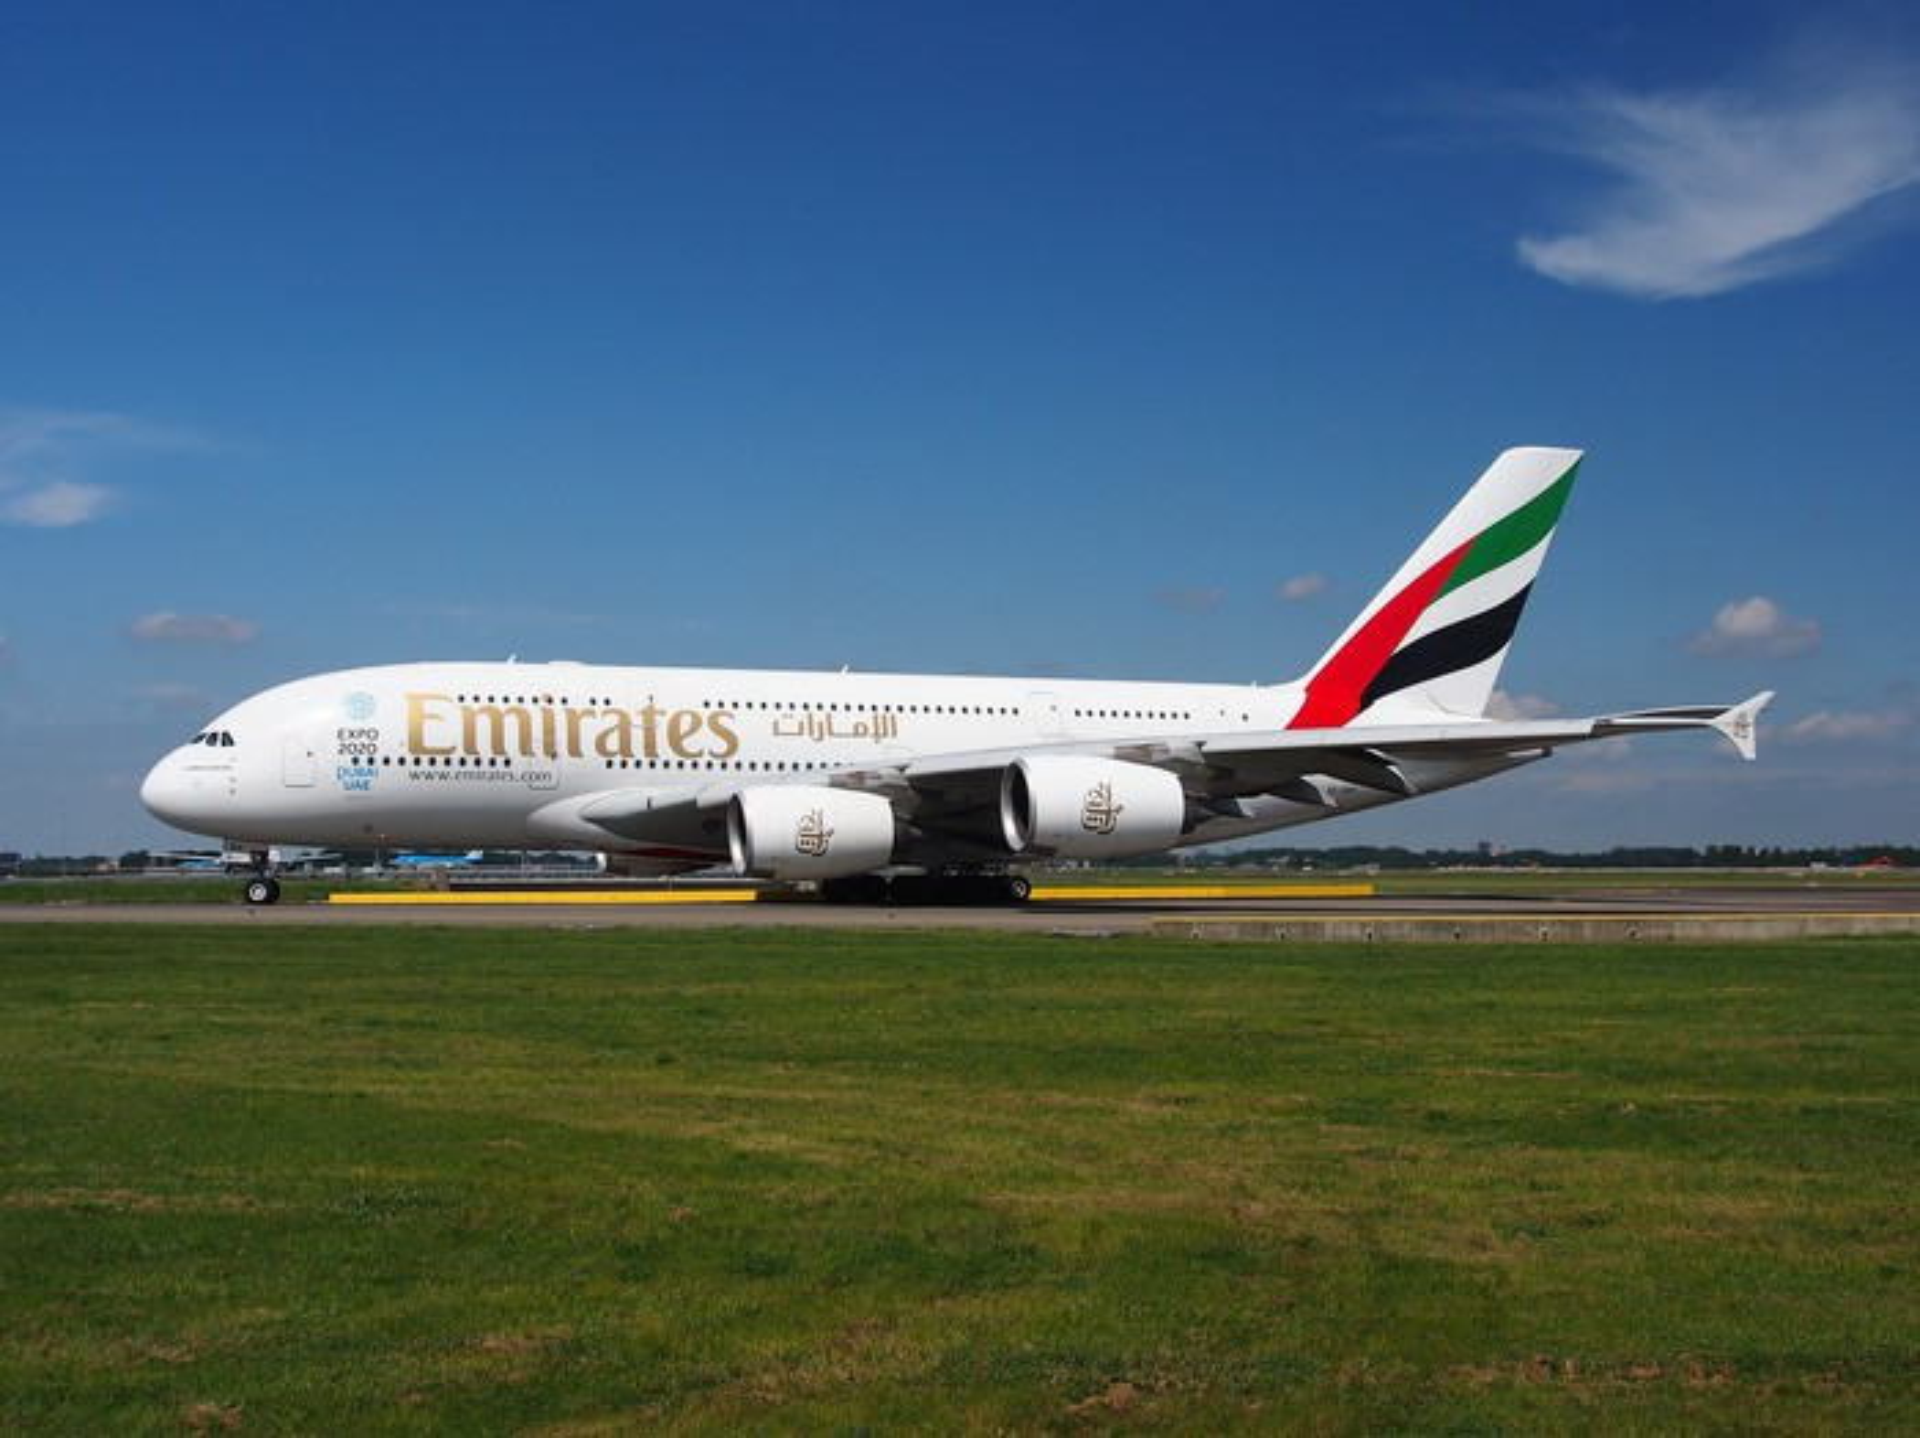 Airbus Won't Miss the A380 Jumbo Jet